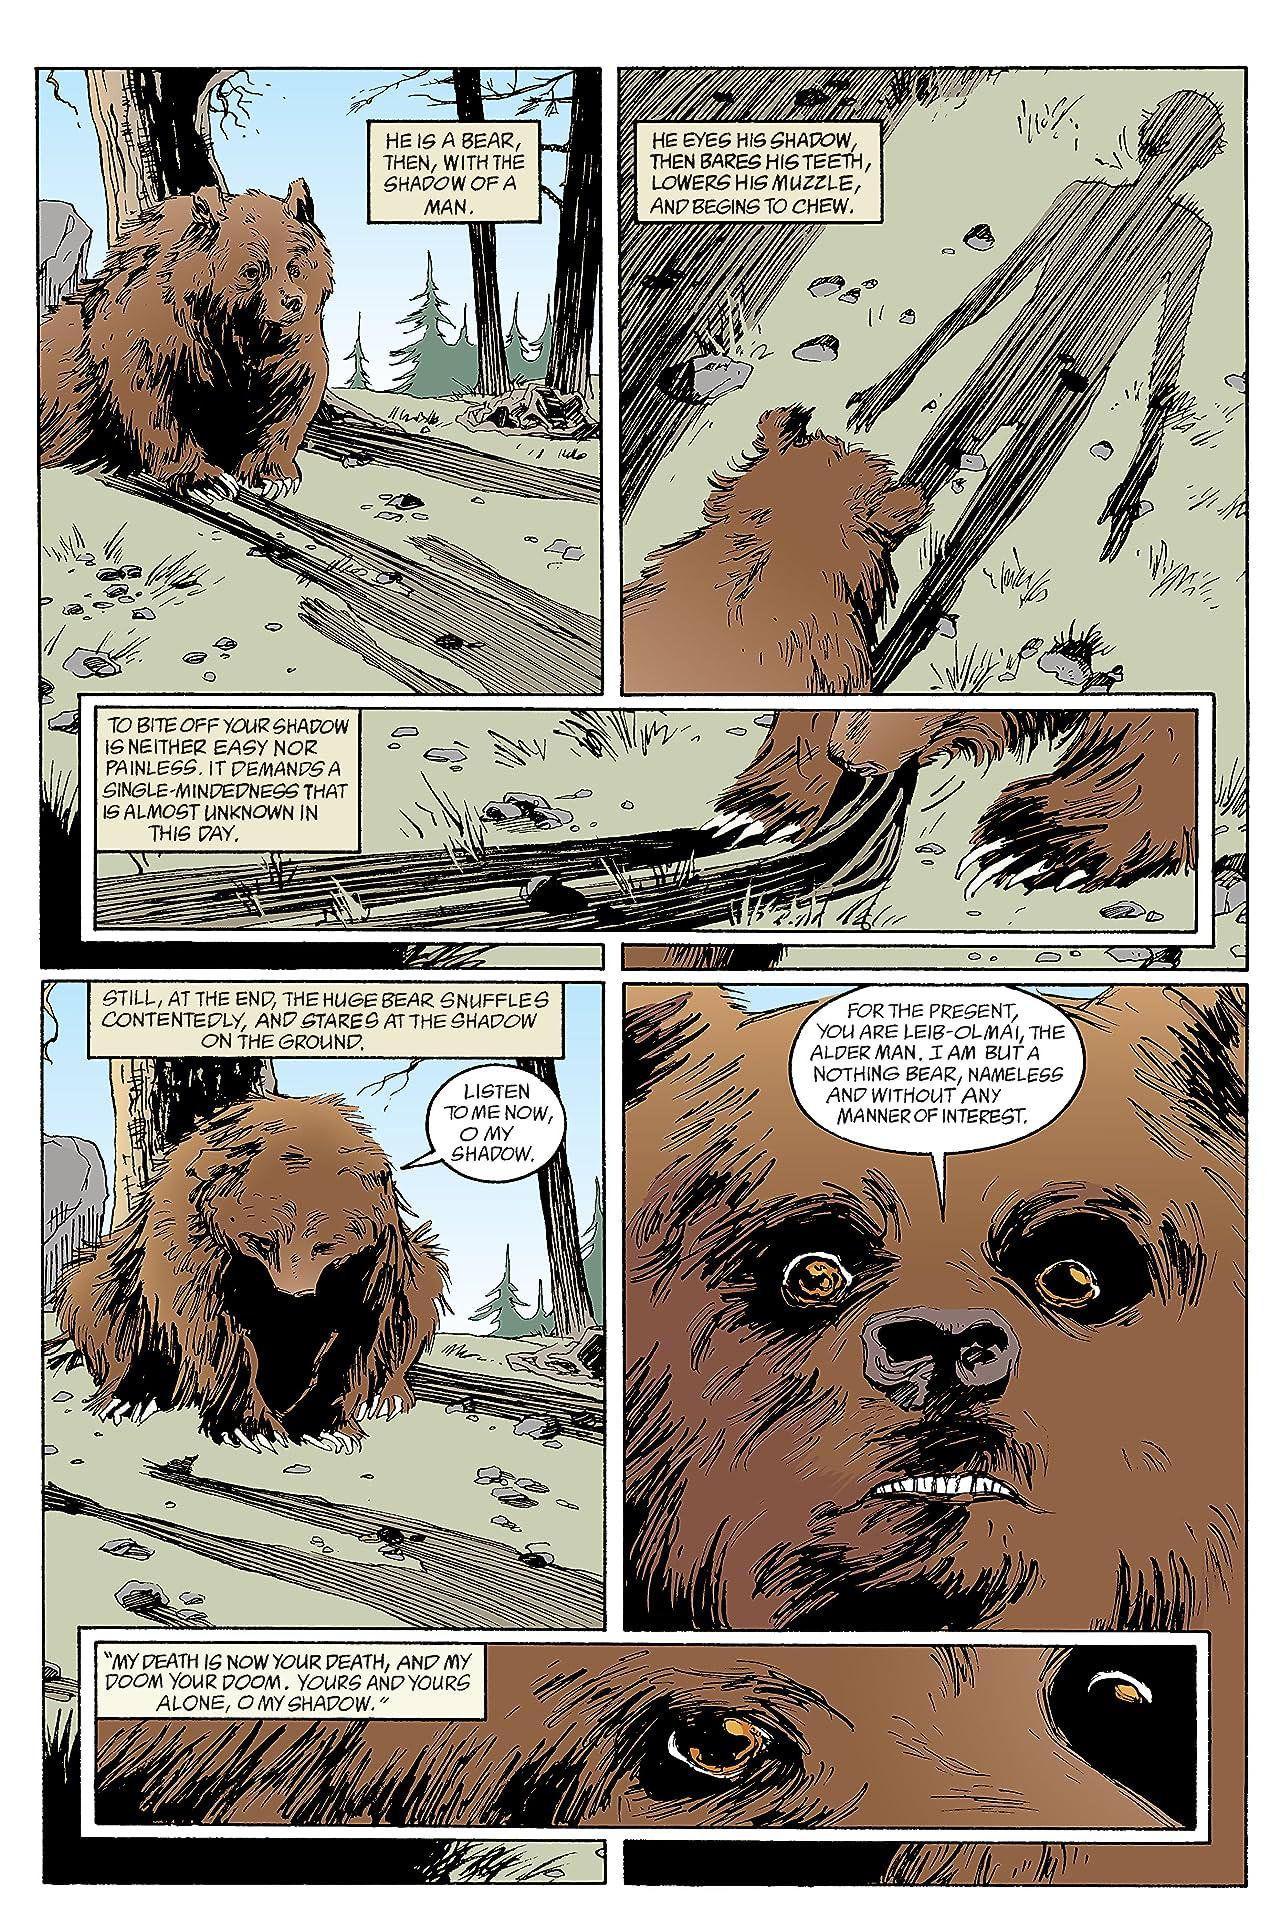 The Sandman #44